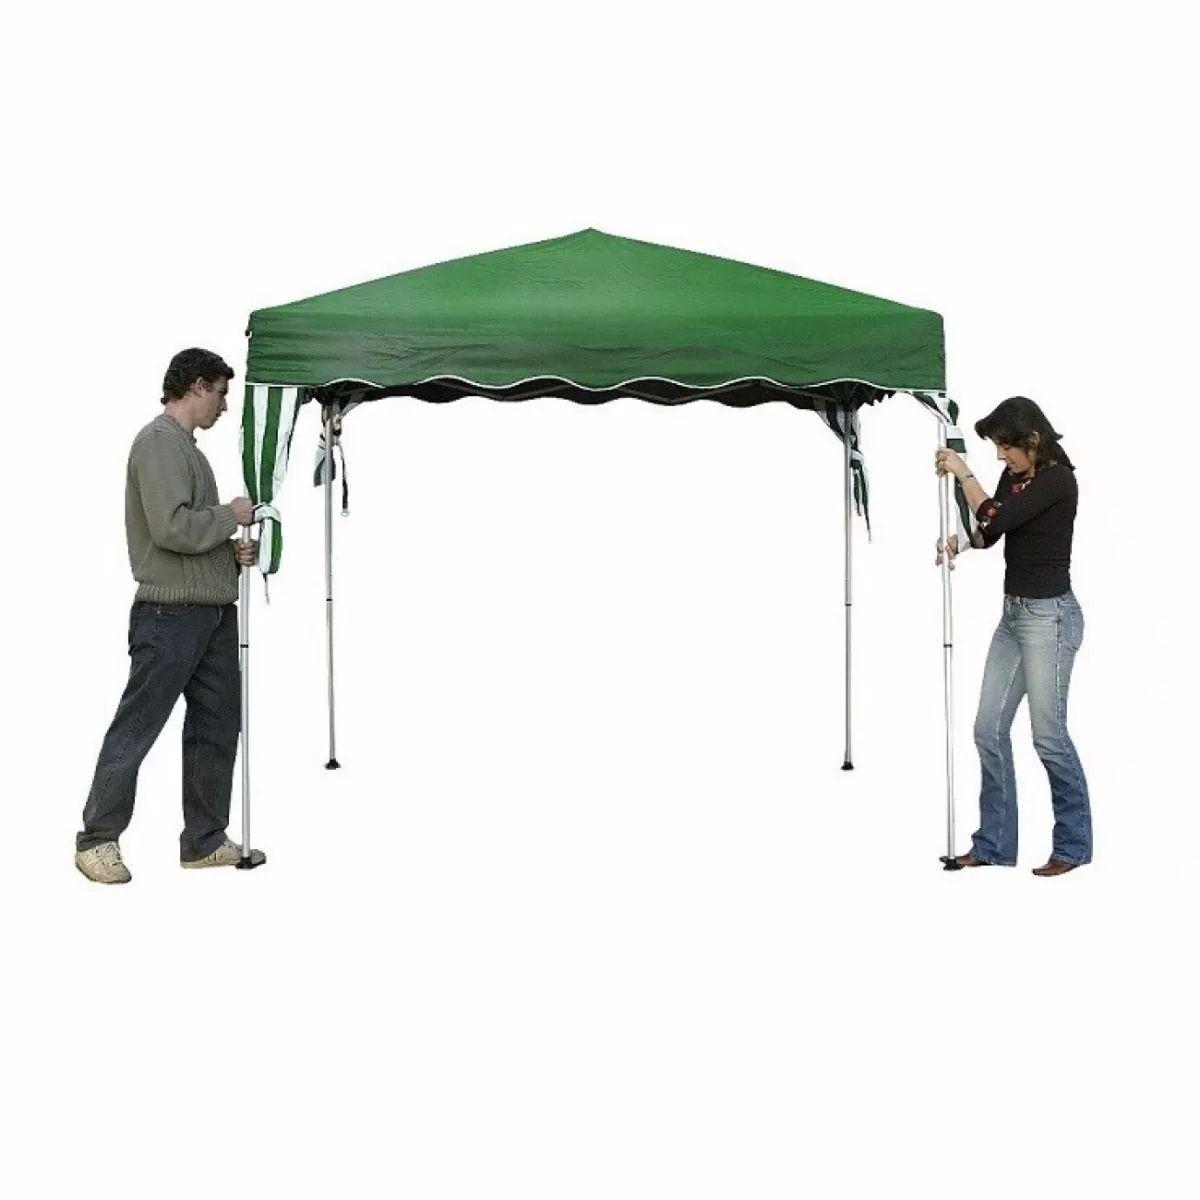 Tenda Gazebo Dobrável Base 2,4mX2,4m Verde Inclinada - Belfix - Loja Portal